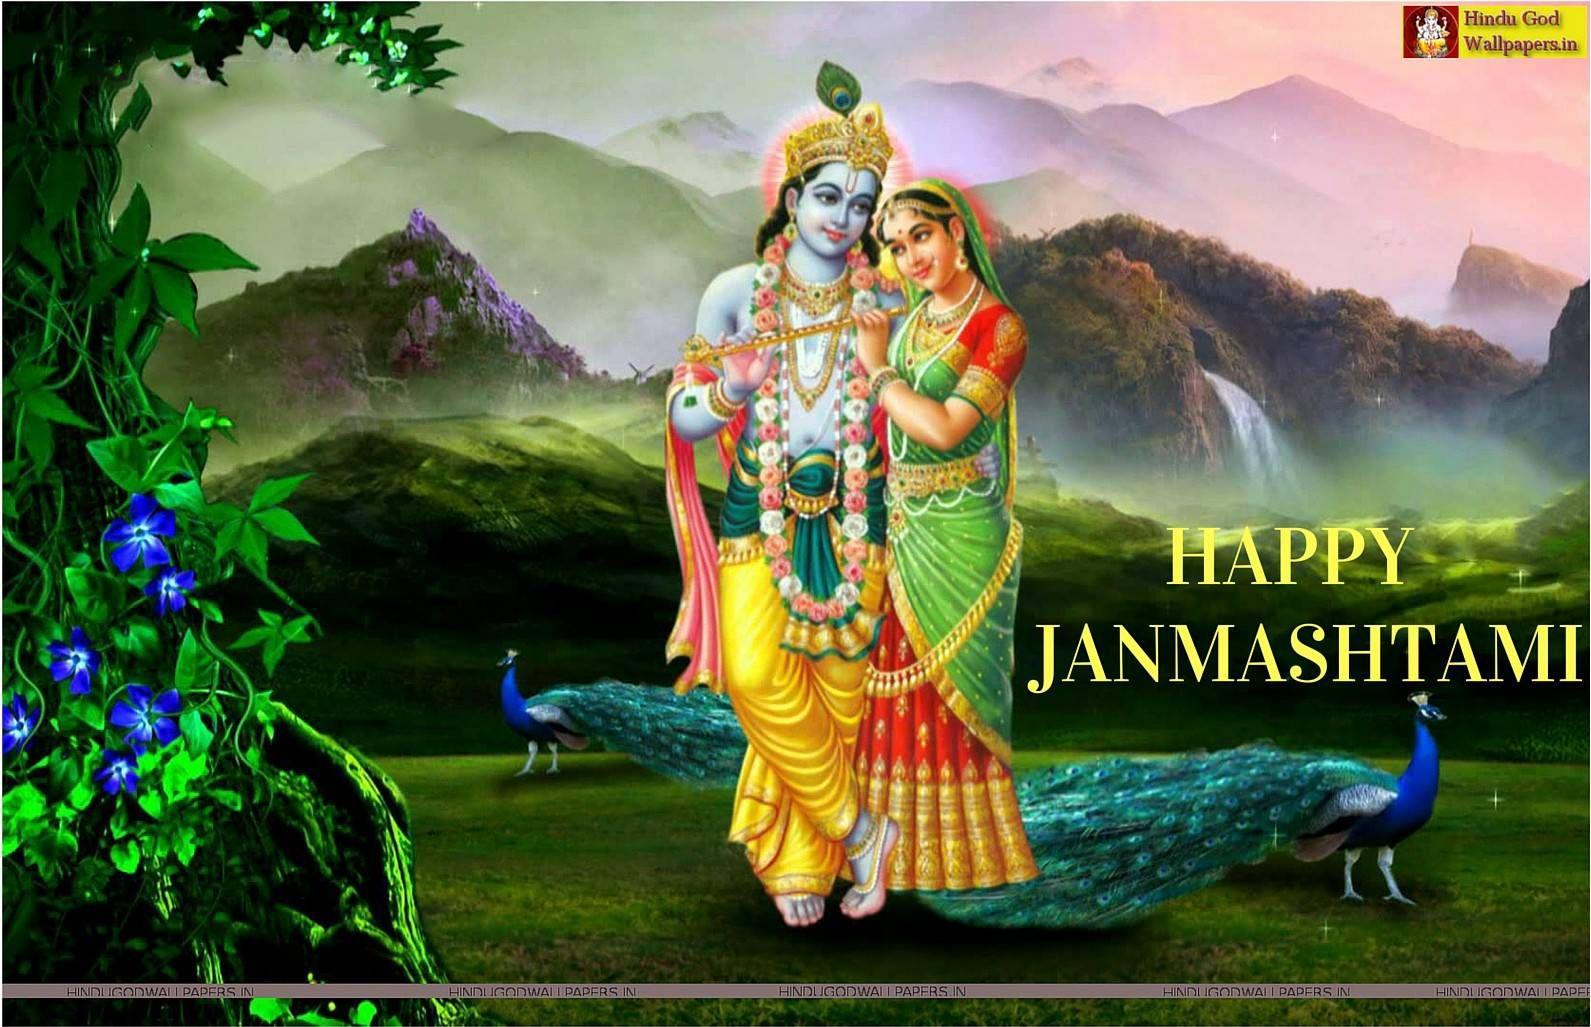 Sri krishna jayanti wallpaper - Free Download Unique Sri Krishna Janmashtami Wallpapers Krishnashtami God Images Hindu God Wallpapers